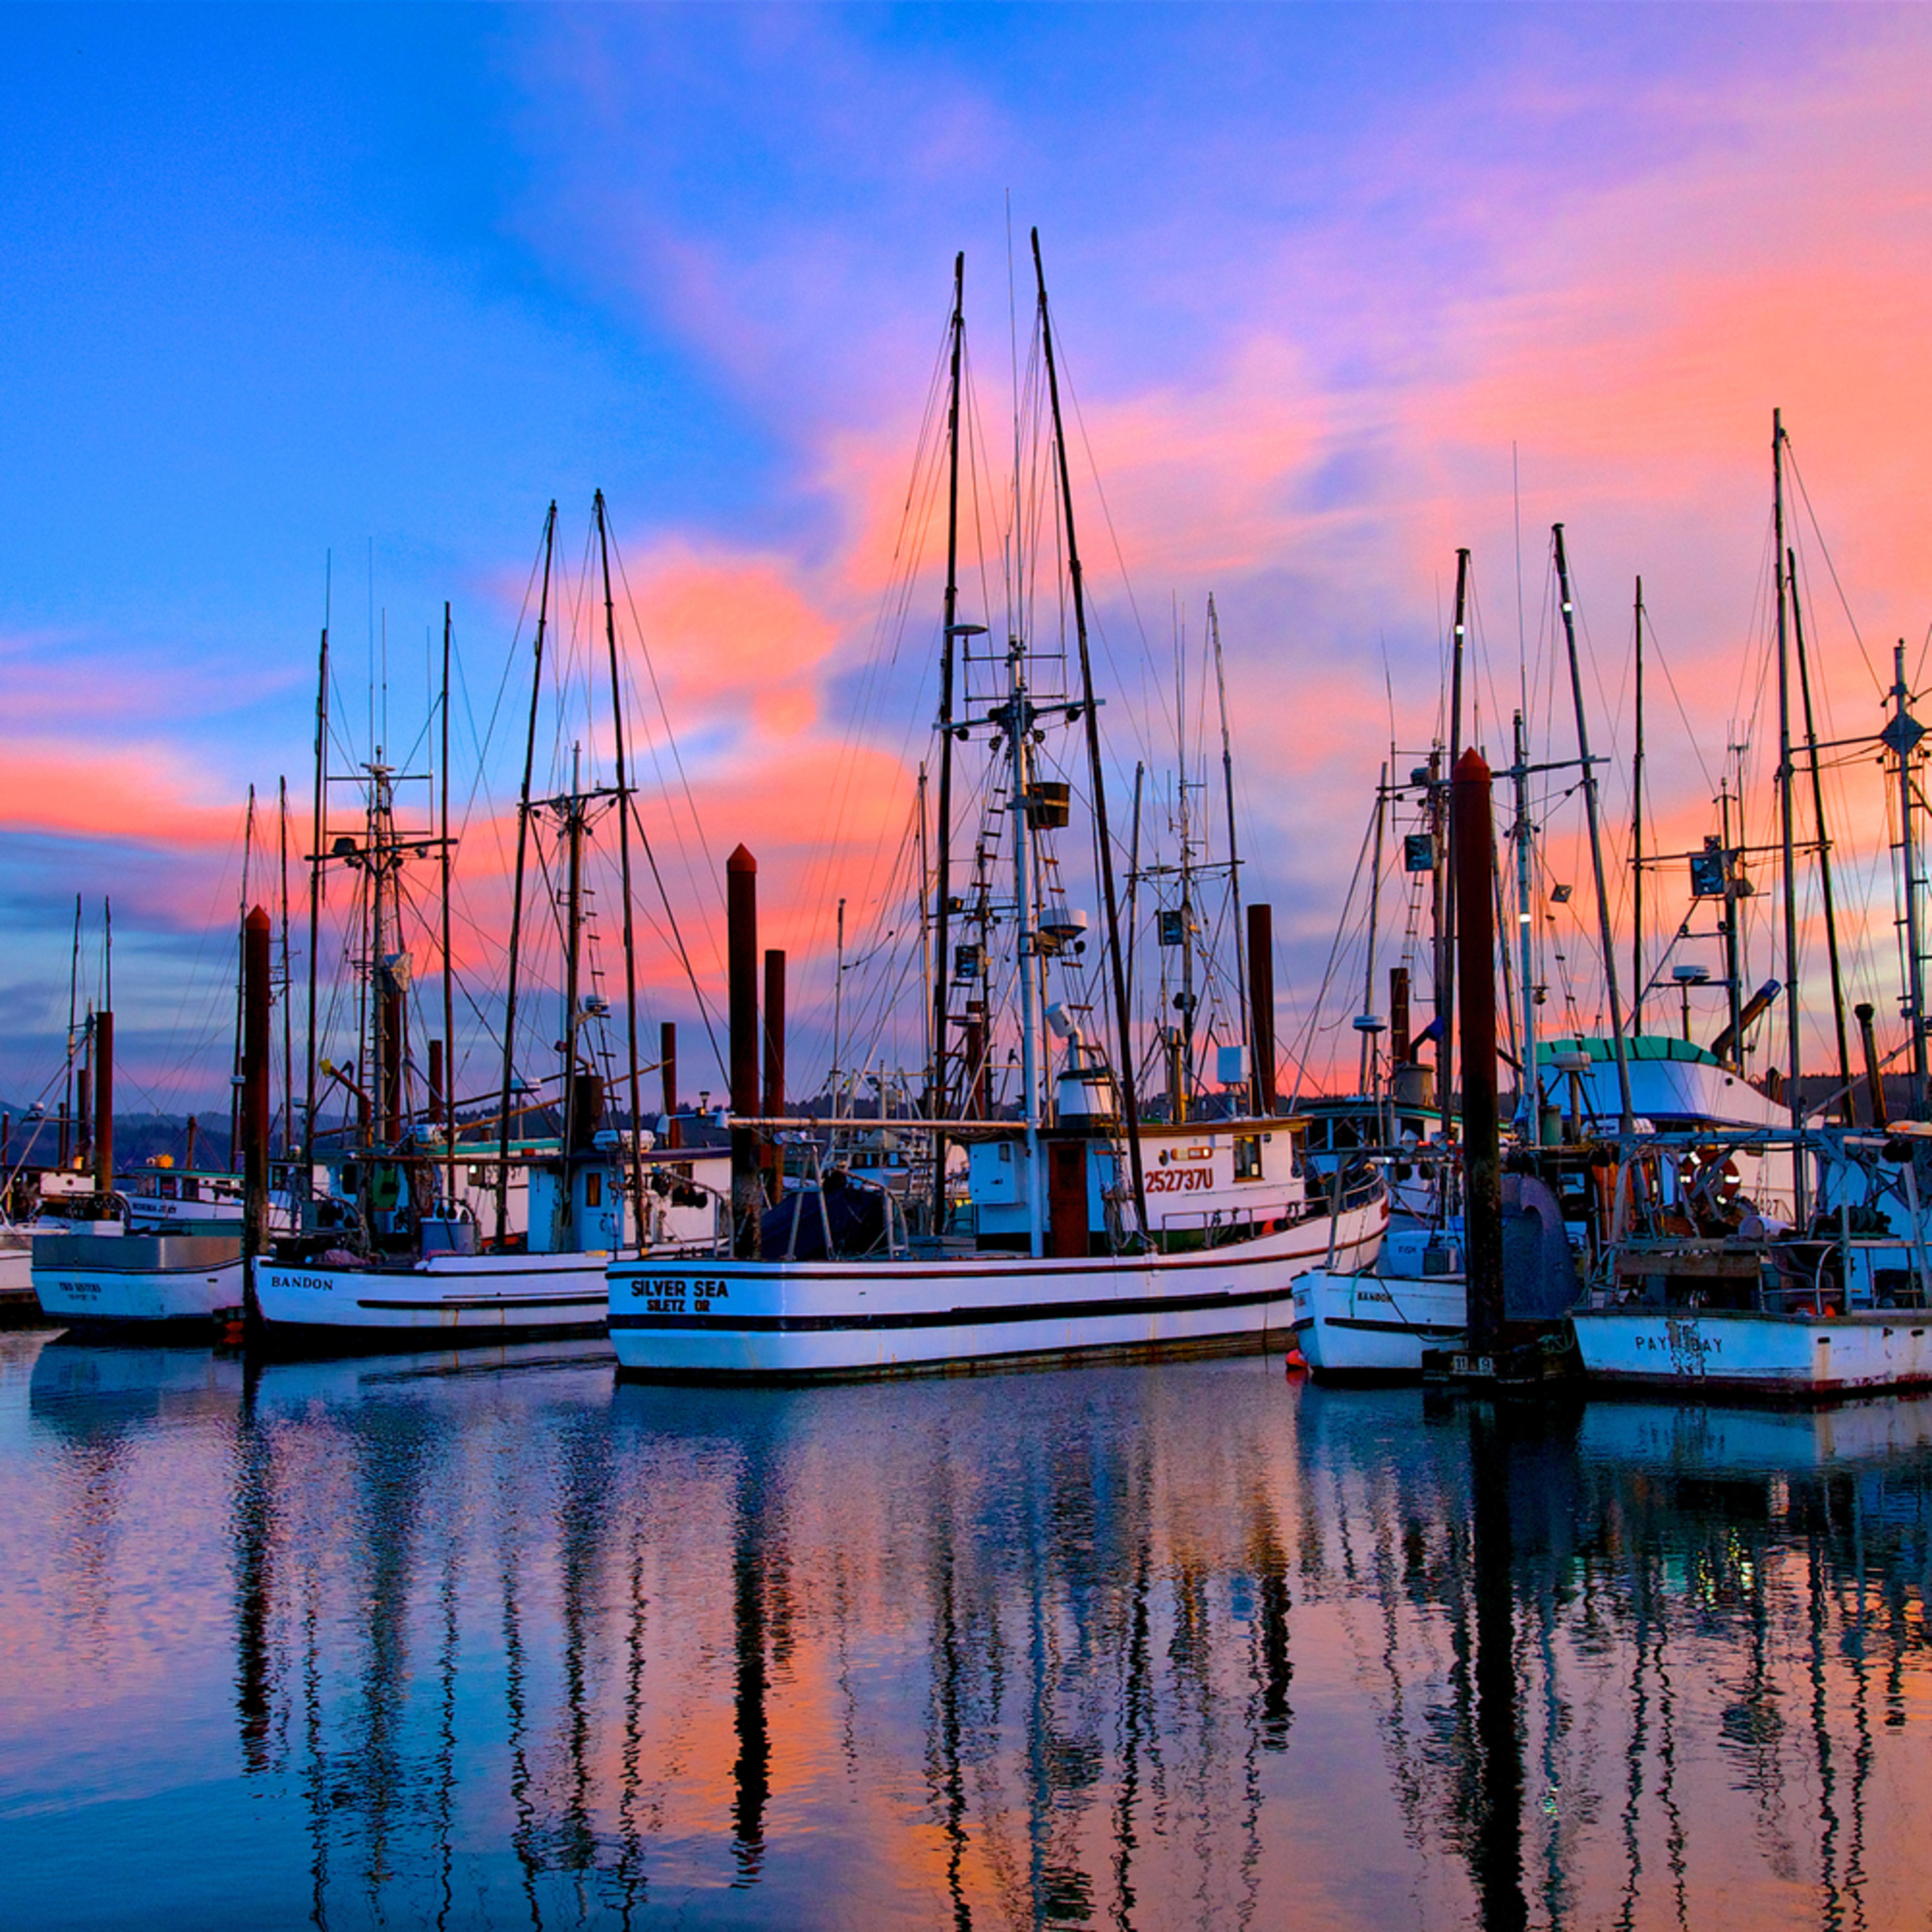 Fishing boats sunset charleston coos bay oregon dpd8pf